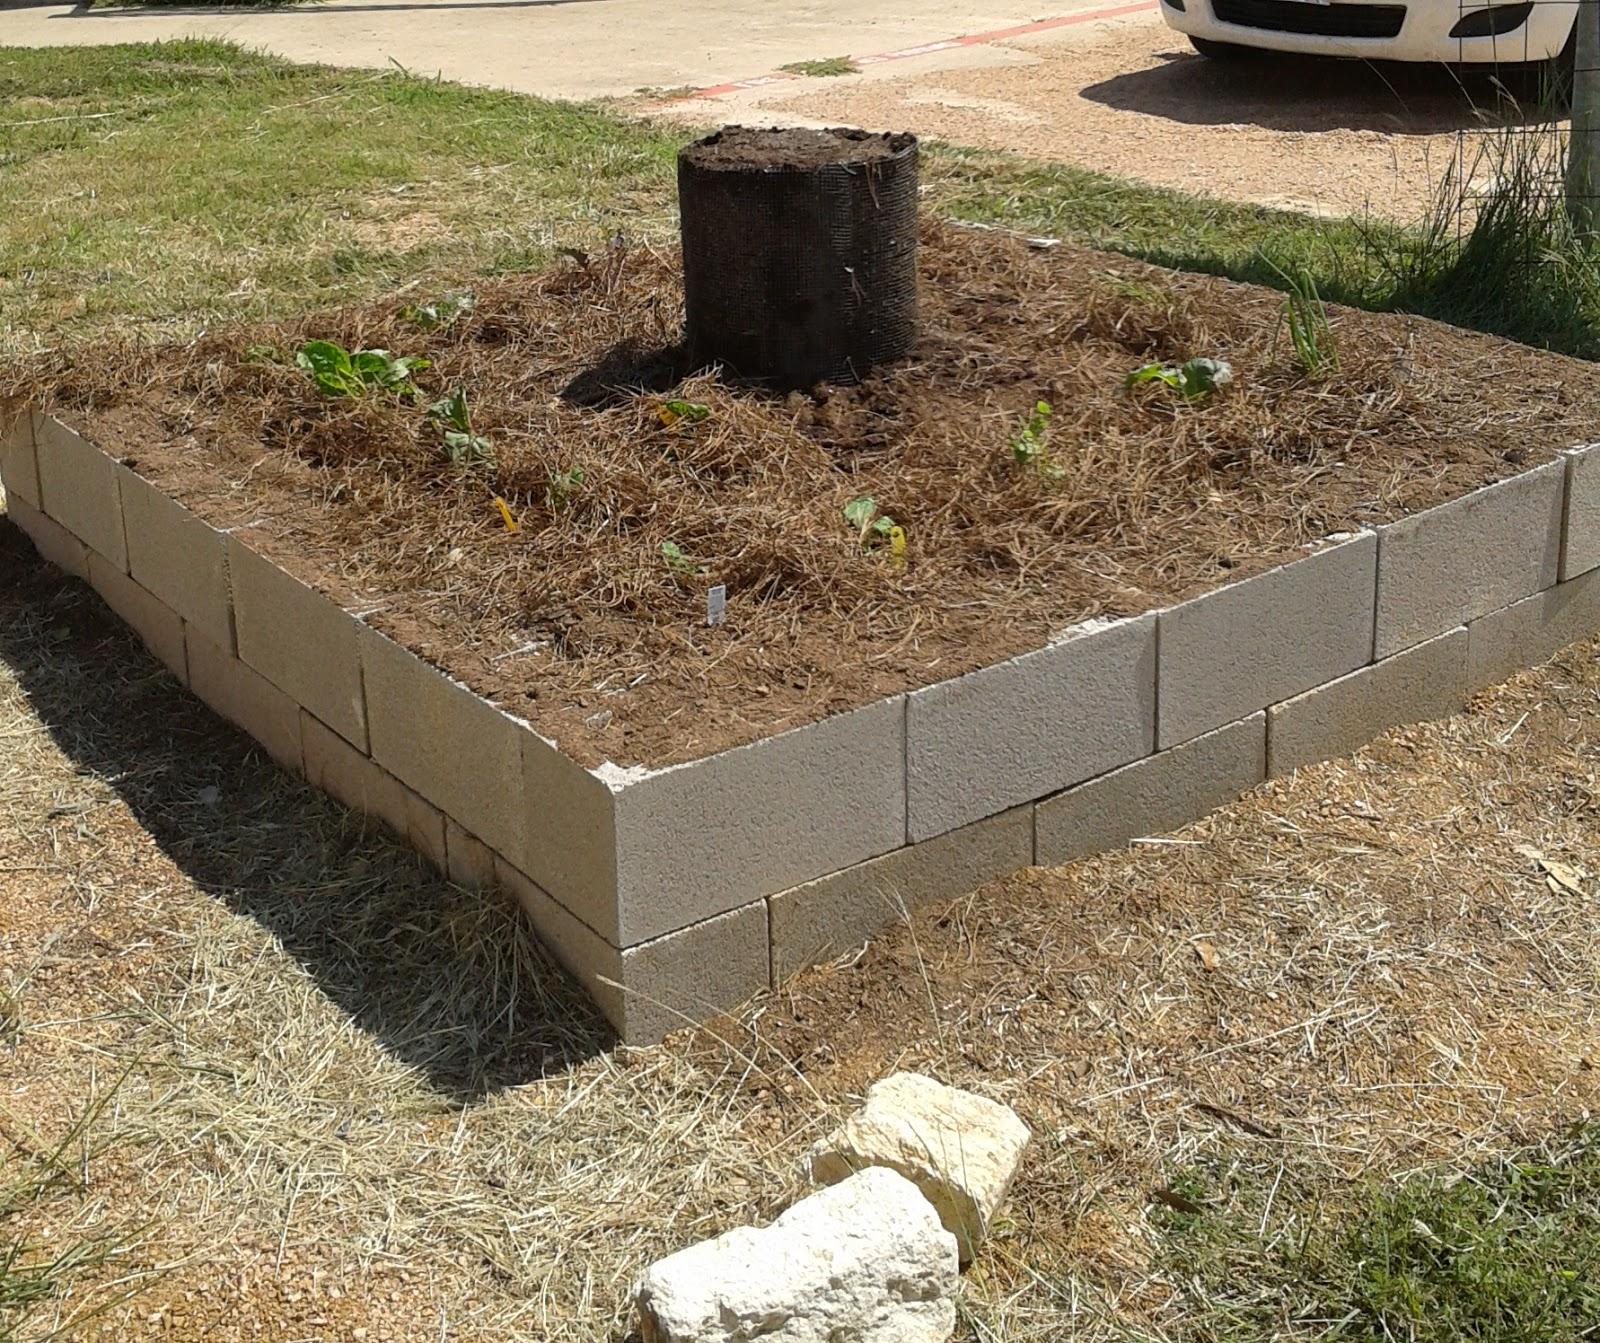 organicgreendoctor: square foot garden